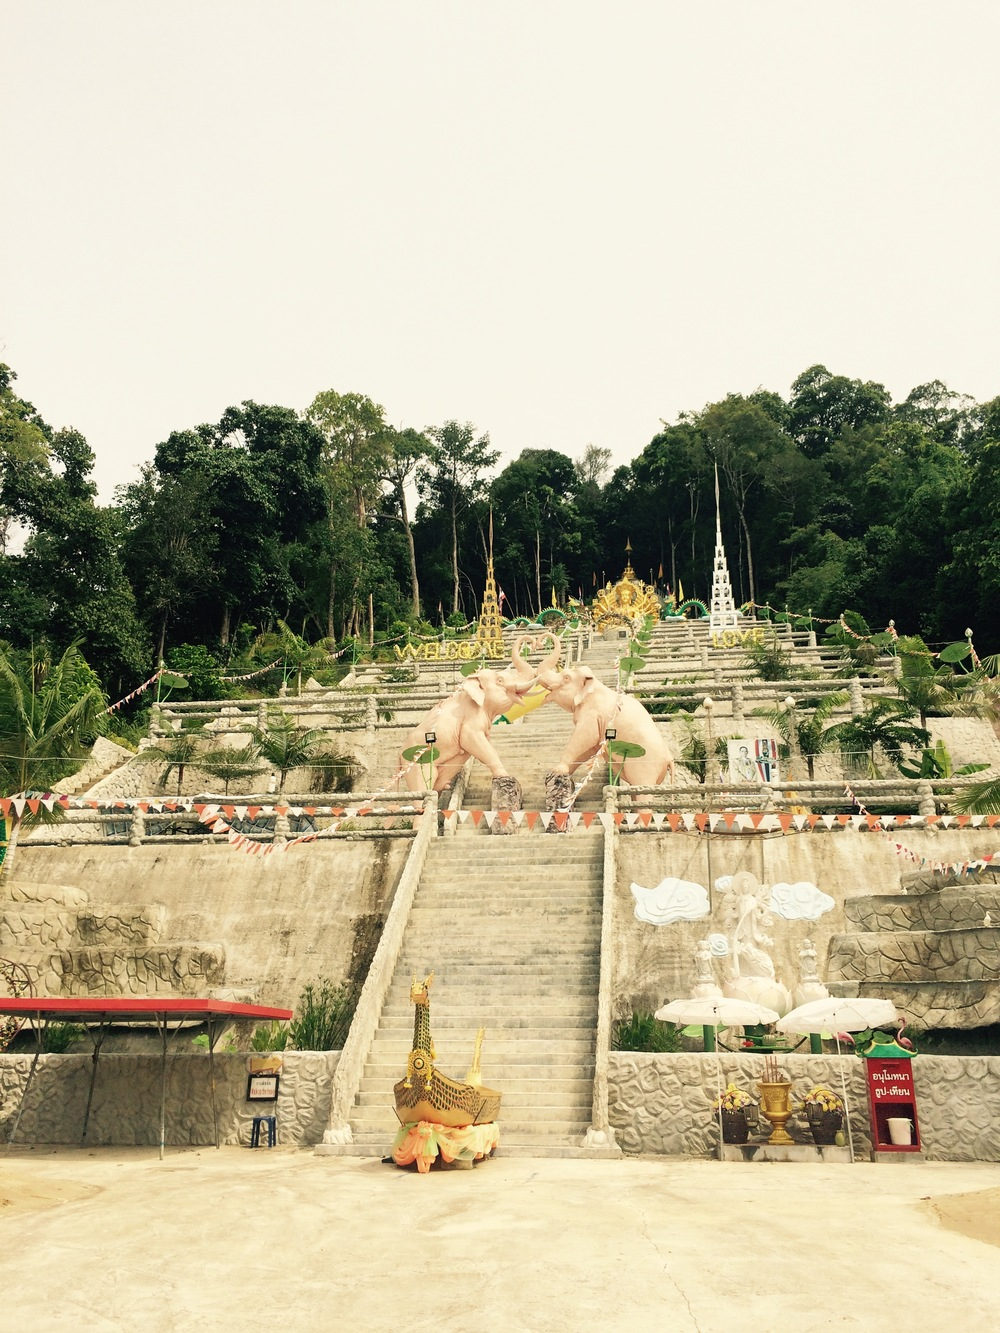 A random temple I came across